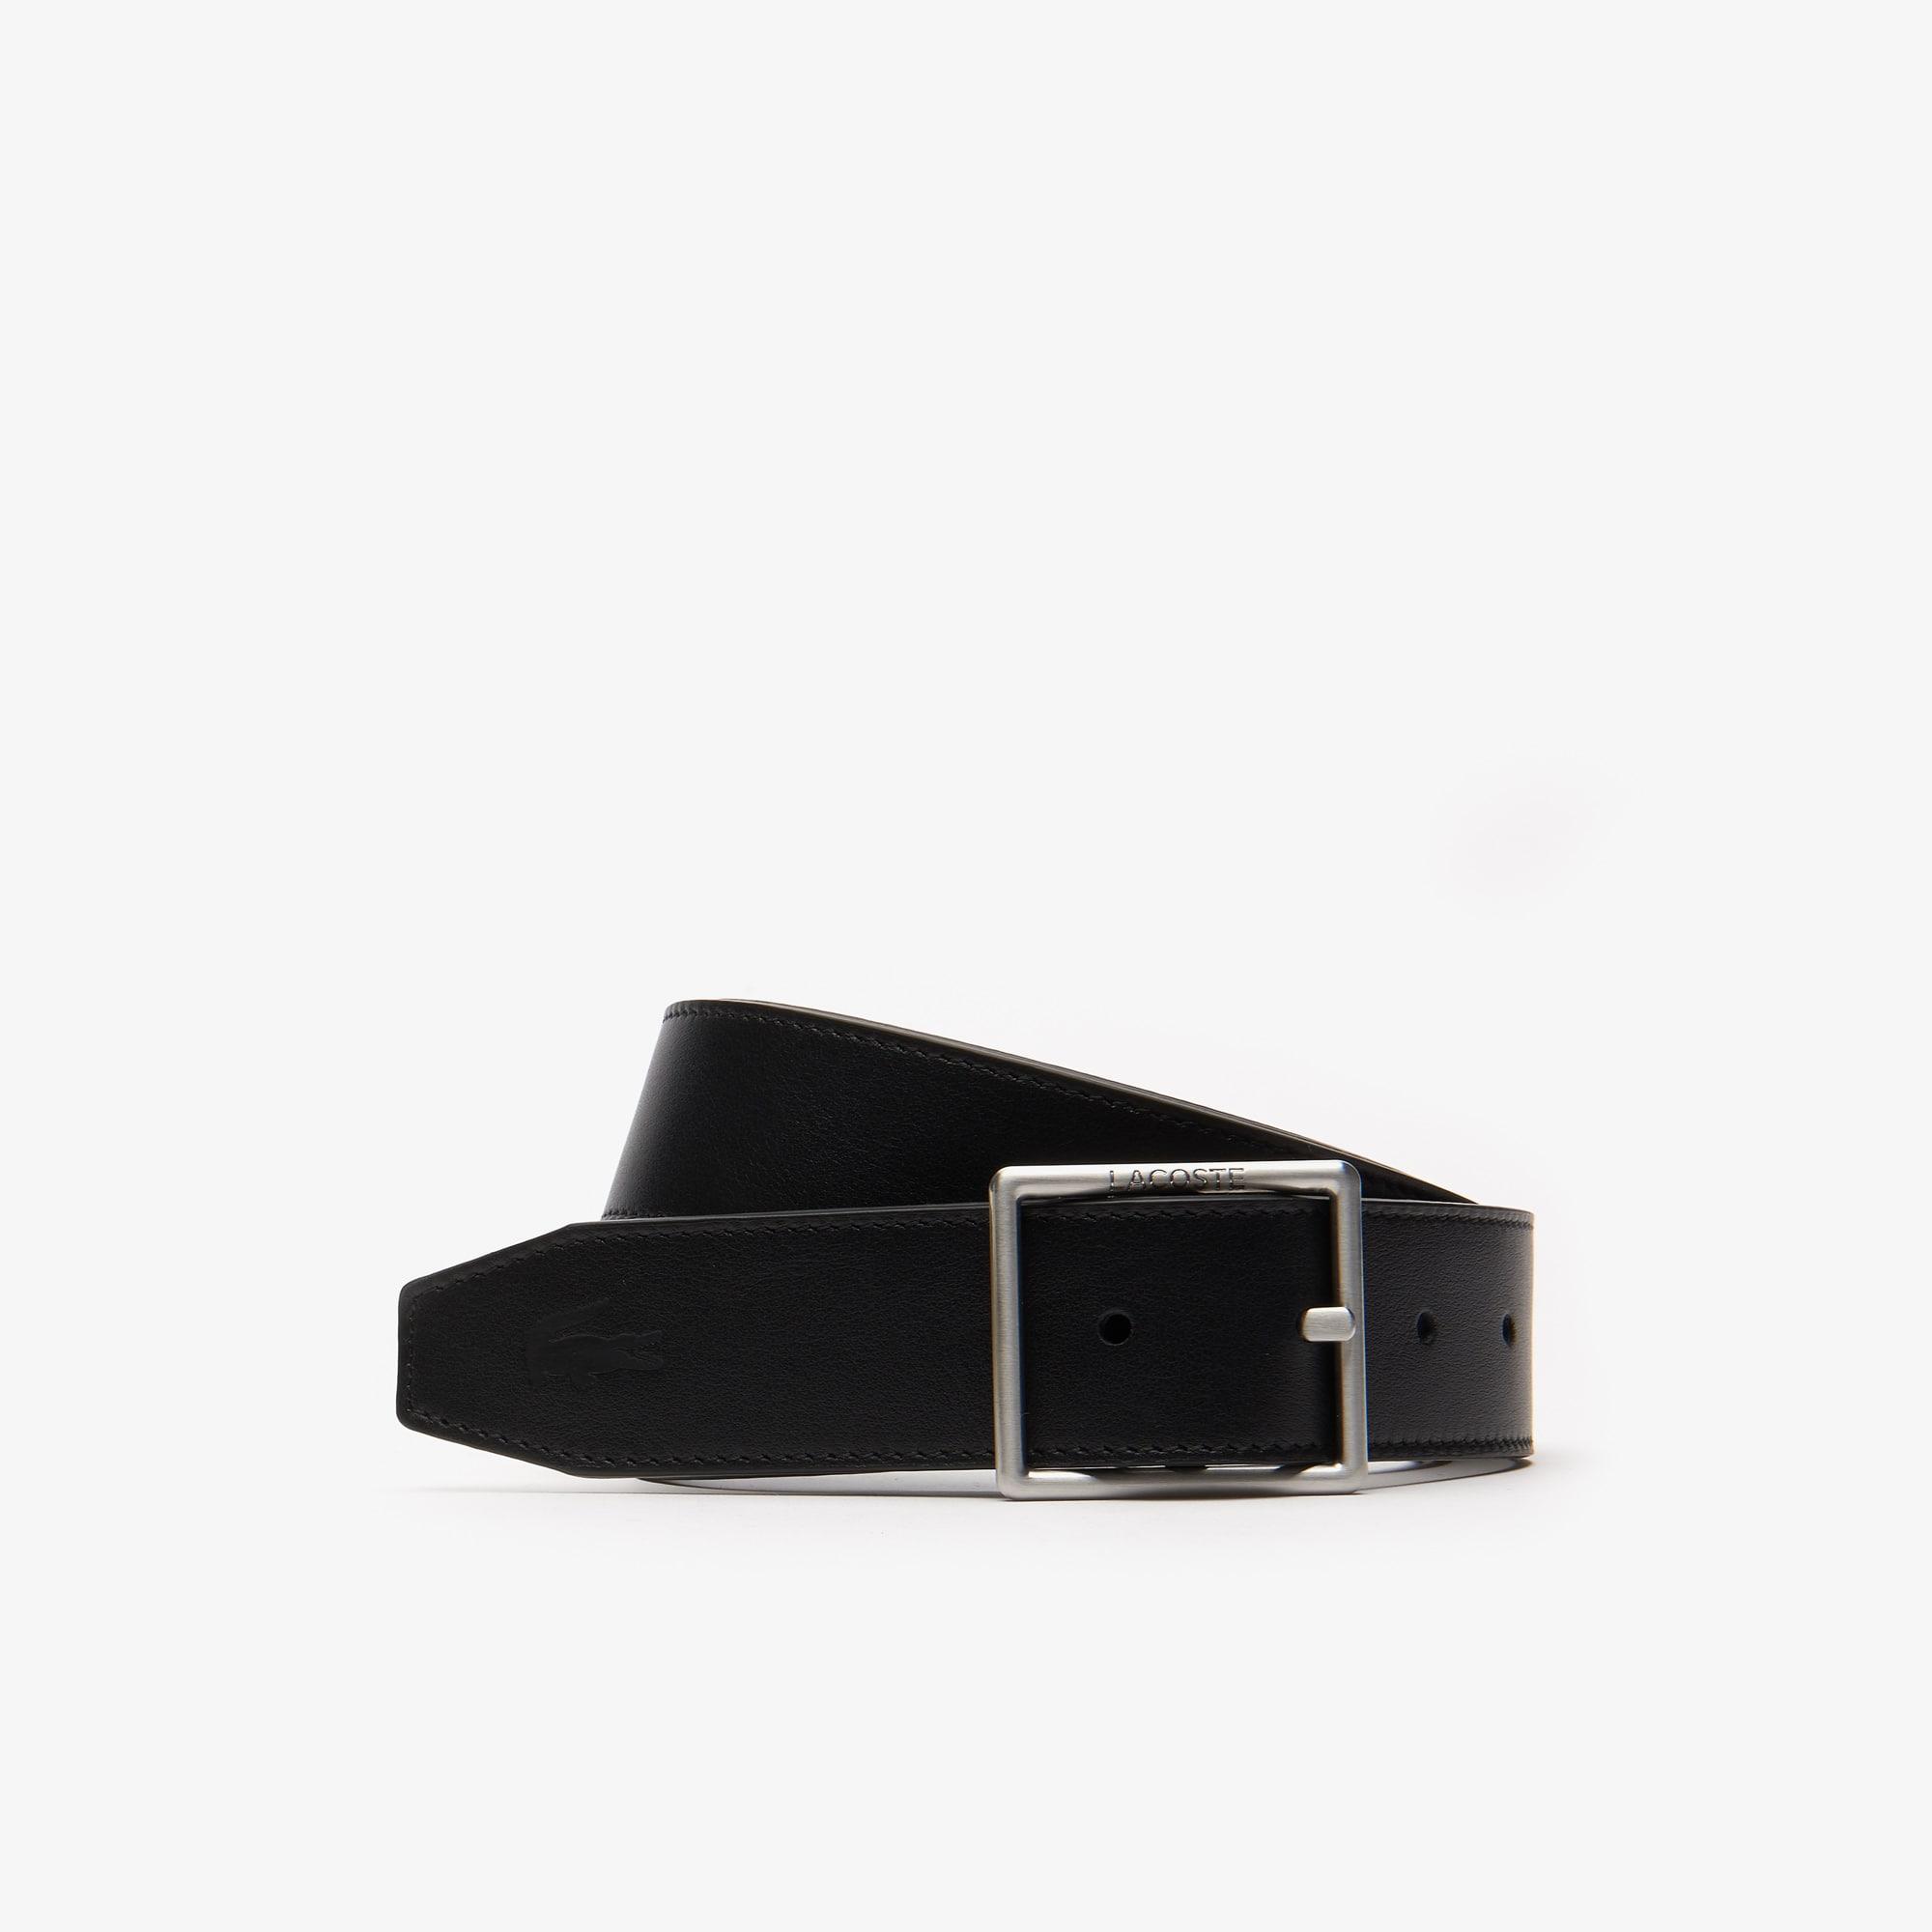 ef5c73e61 Men s Belts